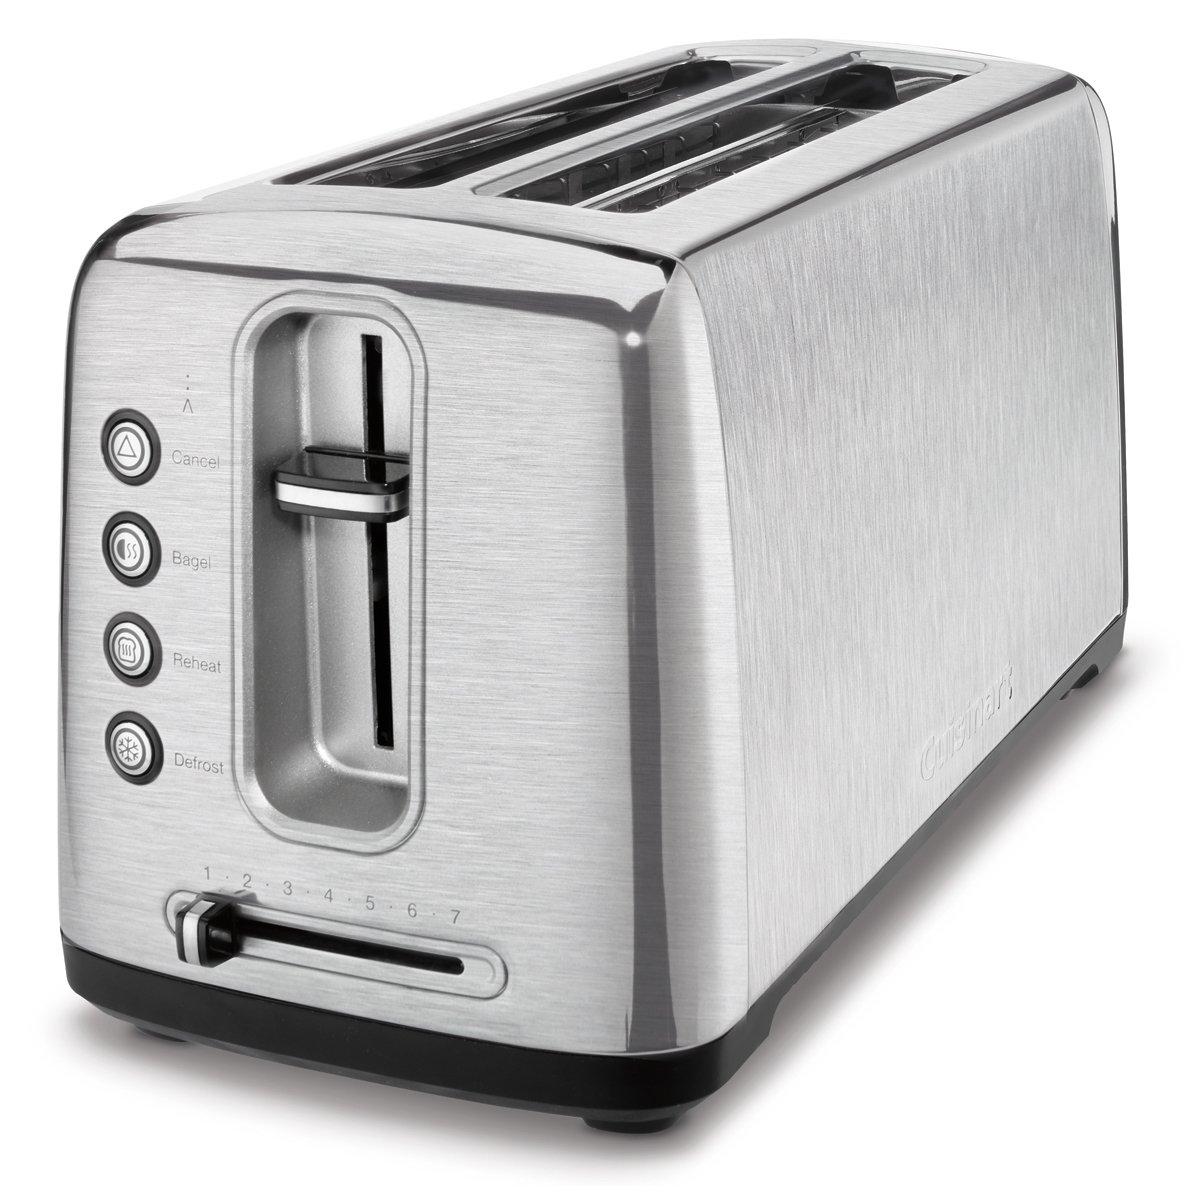 Cuisinart Toaster - 2 Slice - Aluminum - Long Slot